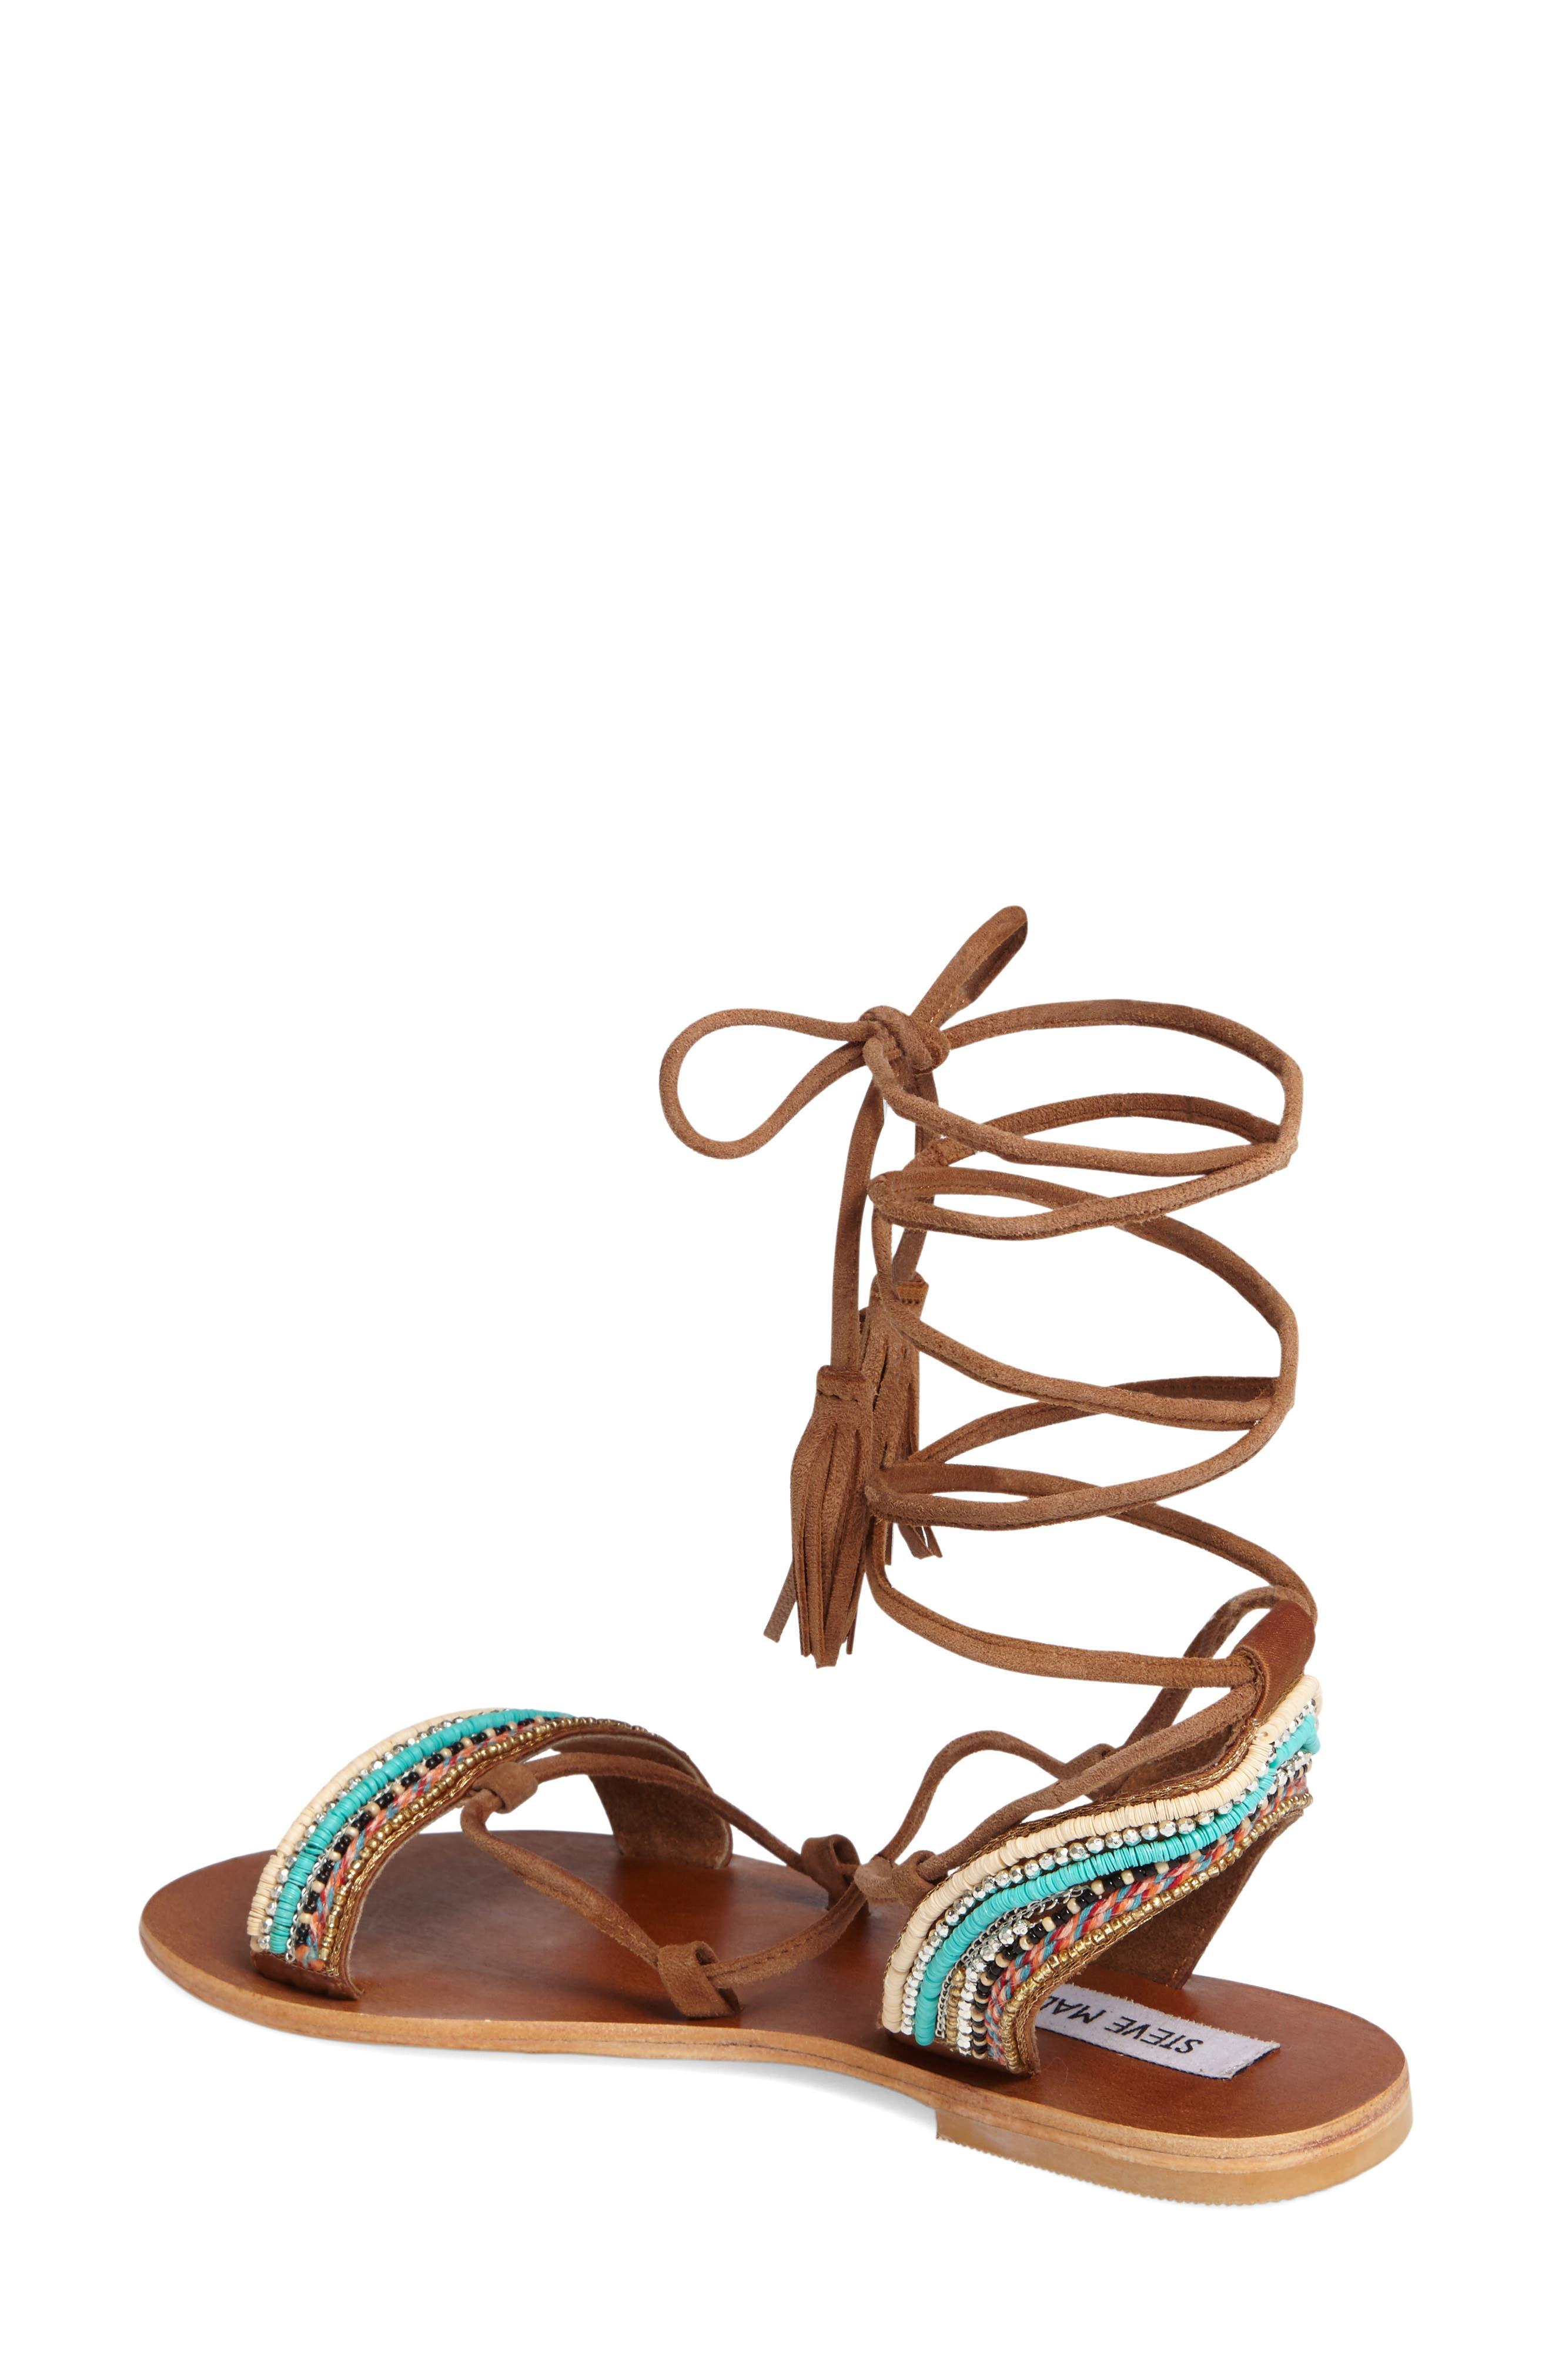 Orva Embellished Ghillie Wrap Sandal,                             Alternate thumbnail 2, color,                             Natural Multi